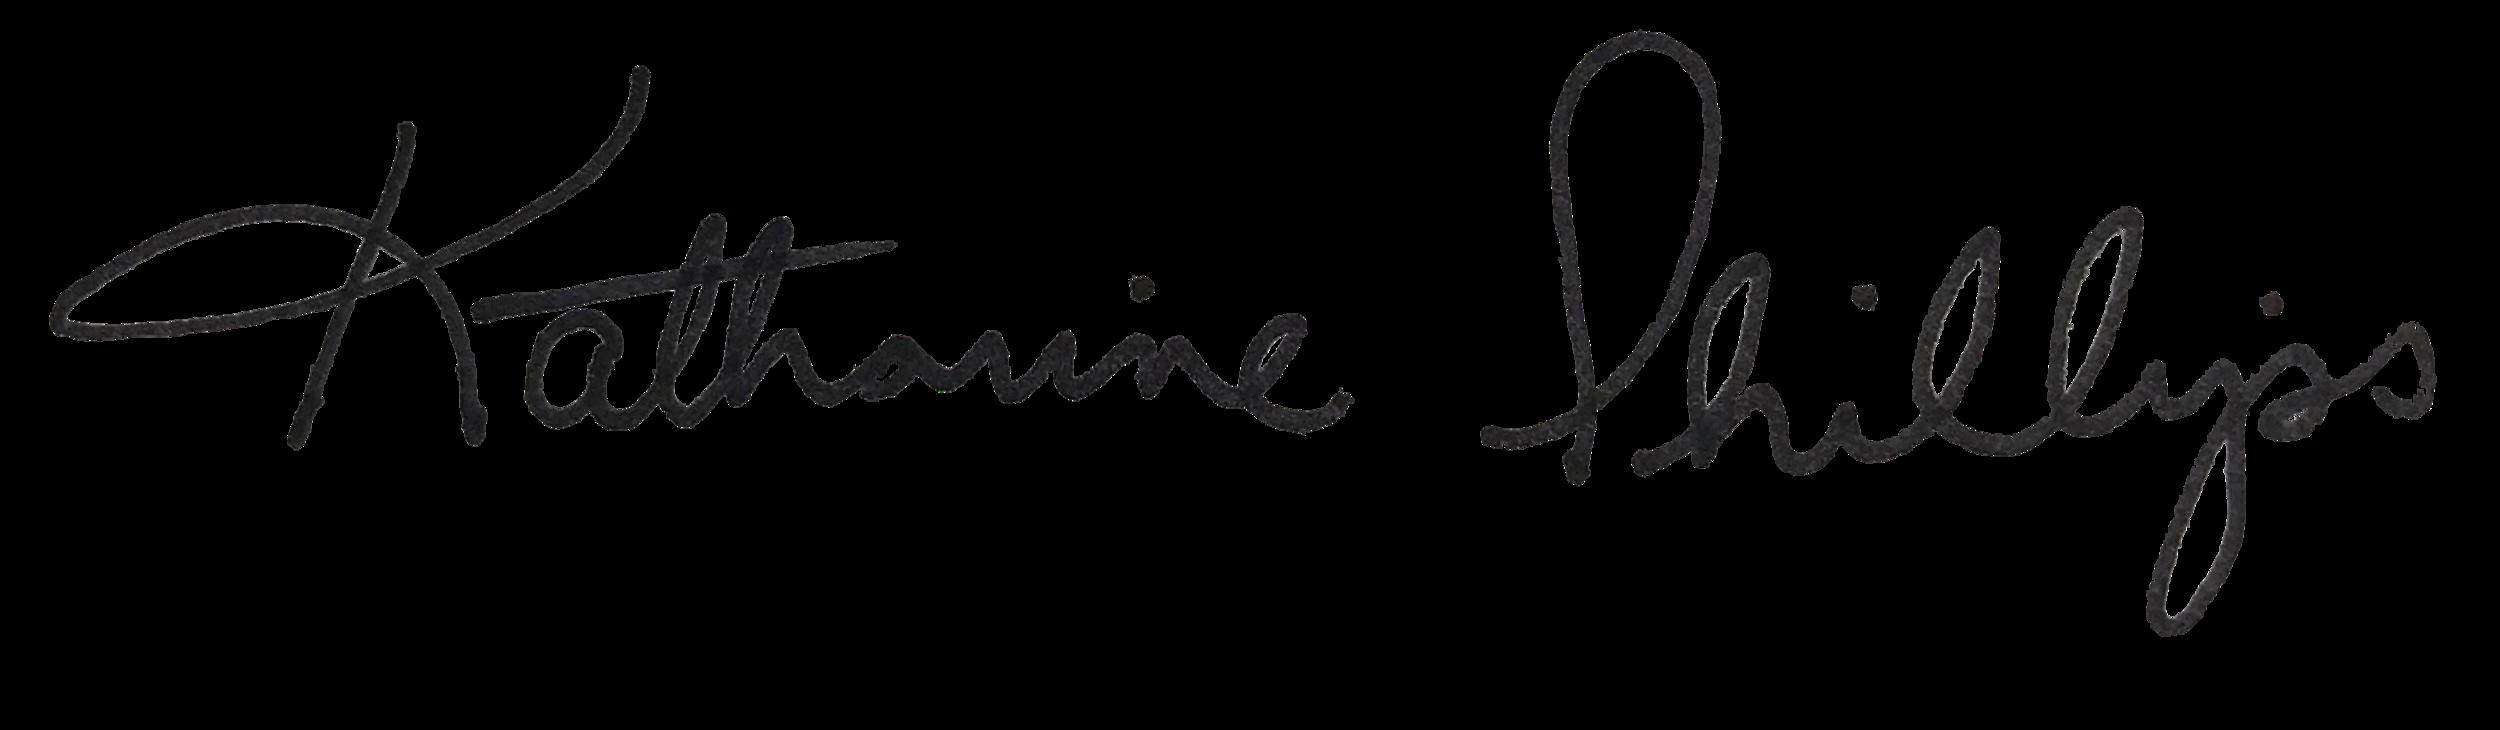 Katharine's Signature.png